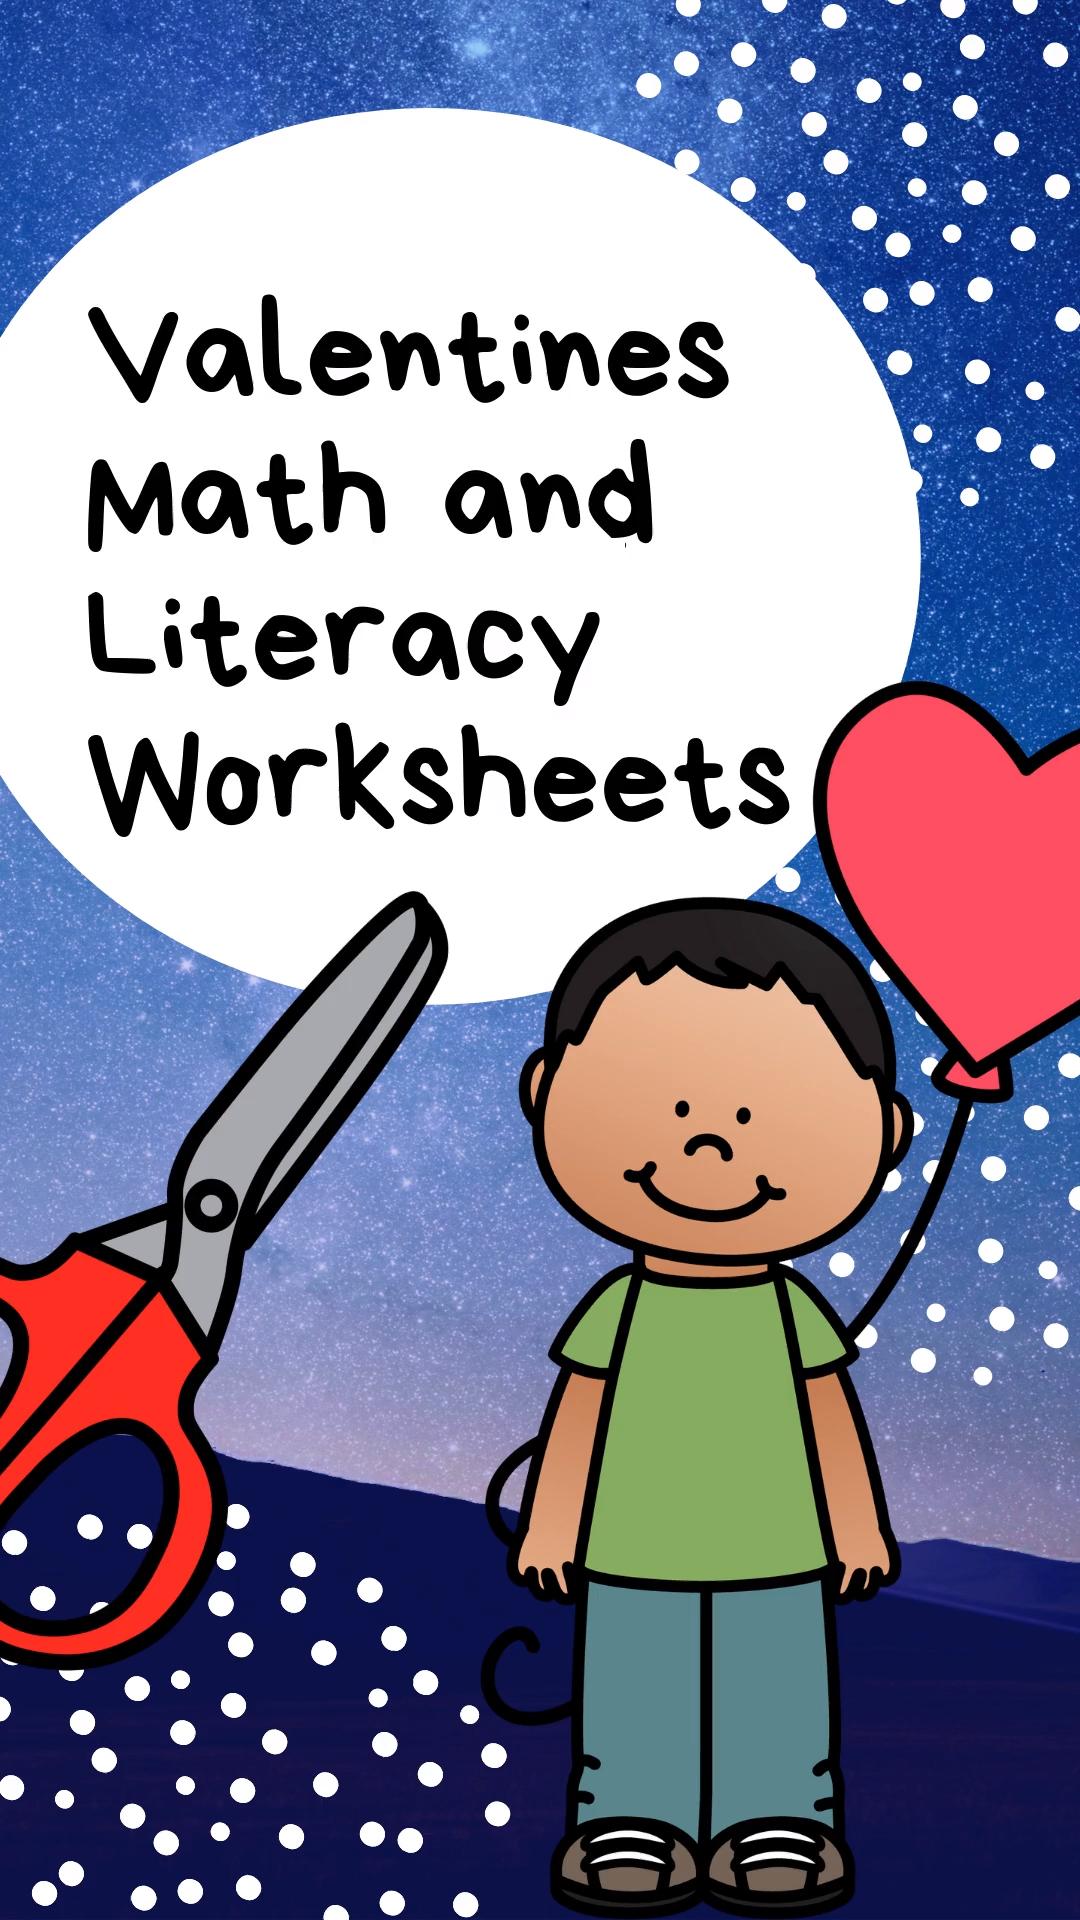 Valentines Math And Literacy Worksheets For Kindergarten